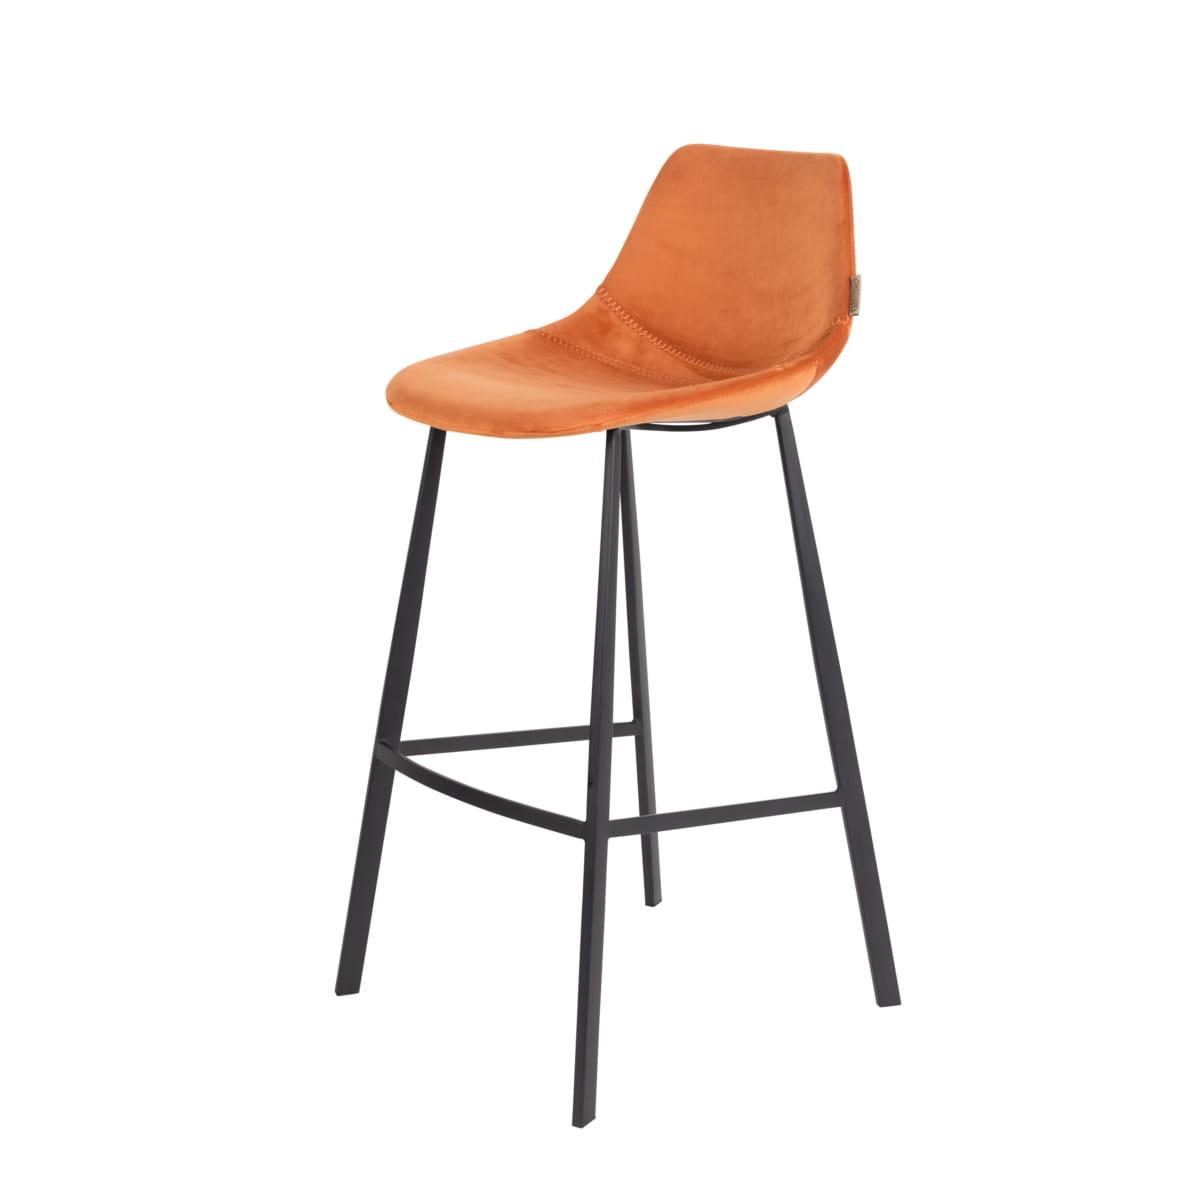 Fabulous Bar Stool Franky Velvet Orange Dutchbone Creativecarmelina Interior Chair Design Creativecarmelinacom